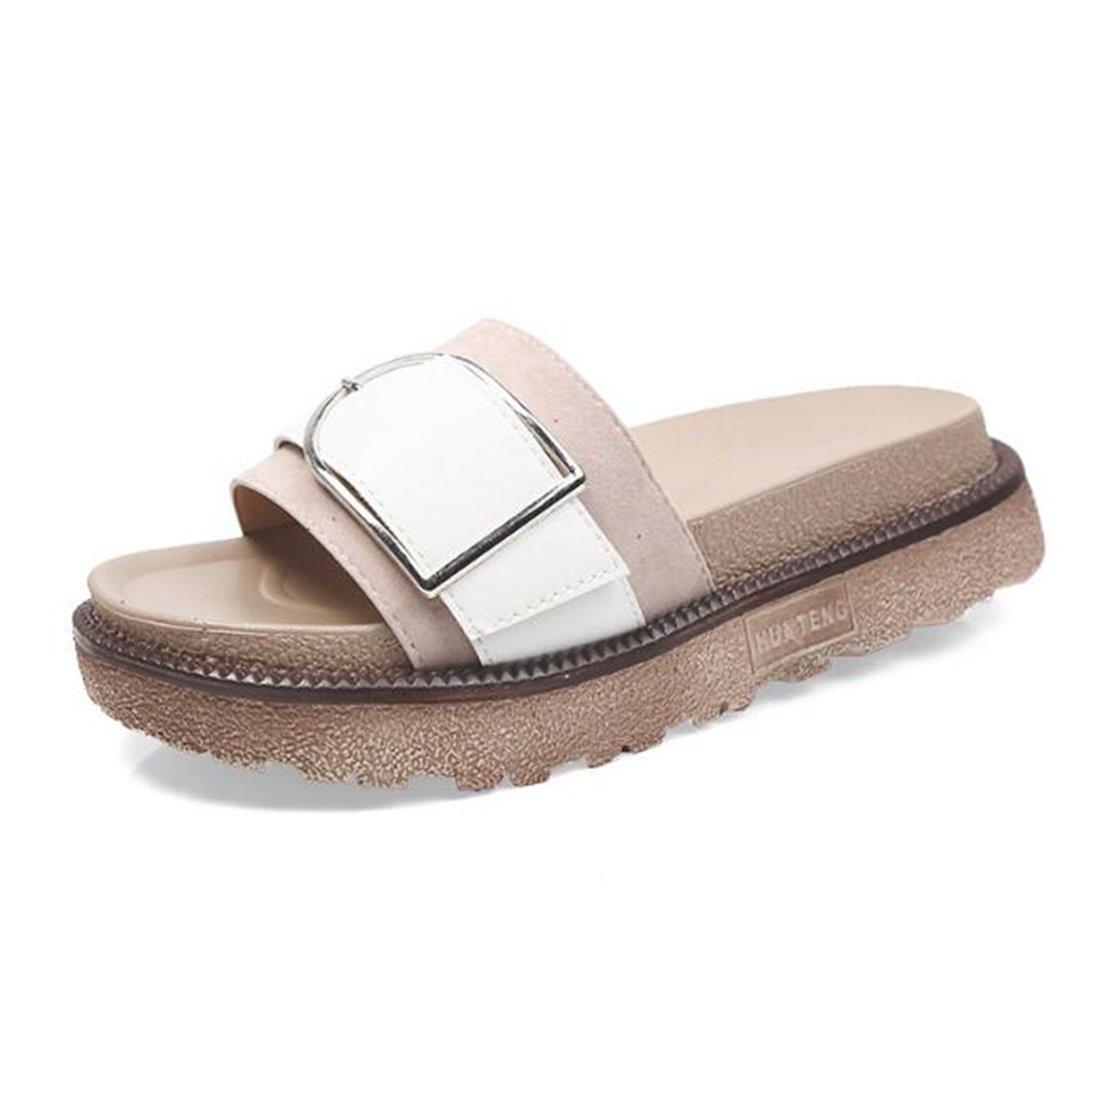 ZHONGST Damen Sommer Sandalen Plateau Sandalen Flachen Sandalen Casual Sandalen  36|Pink